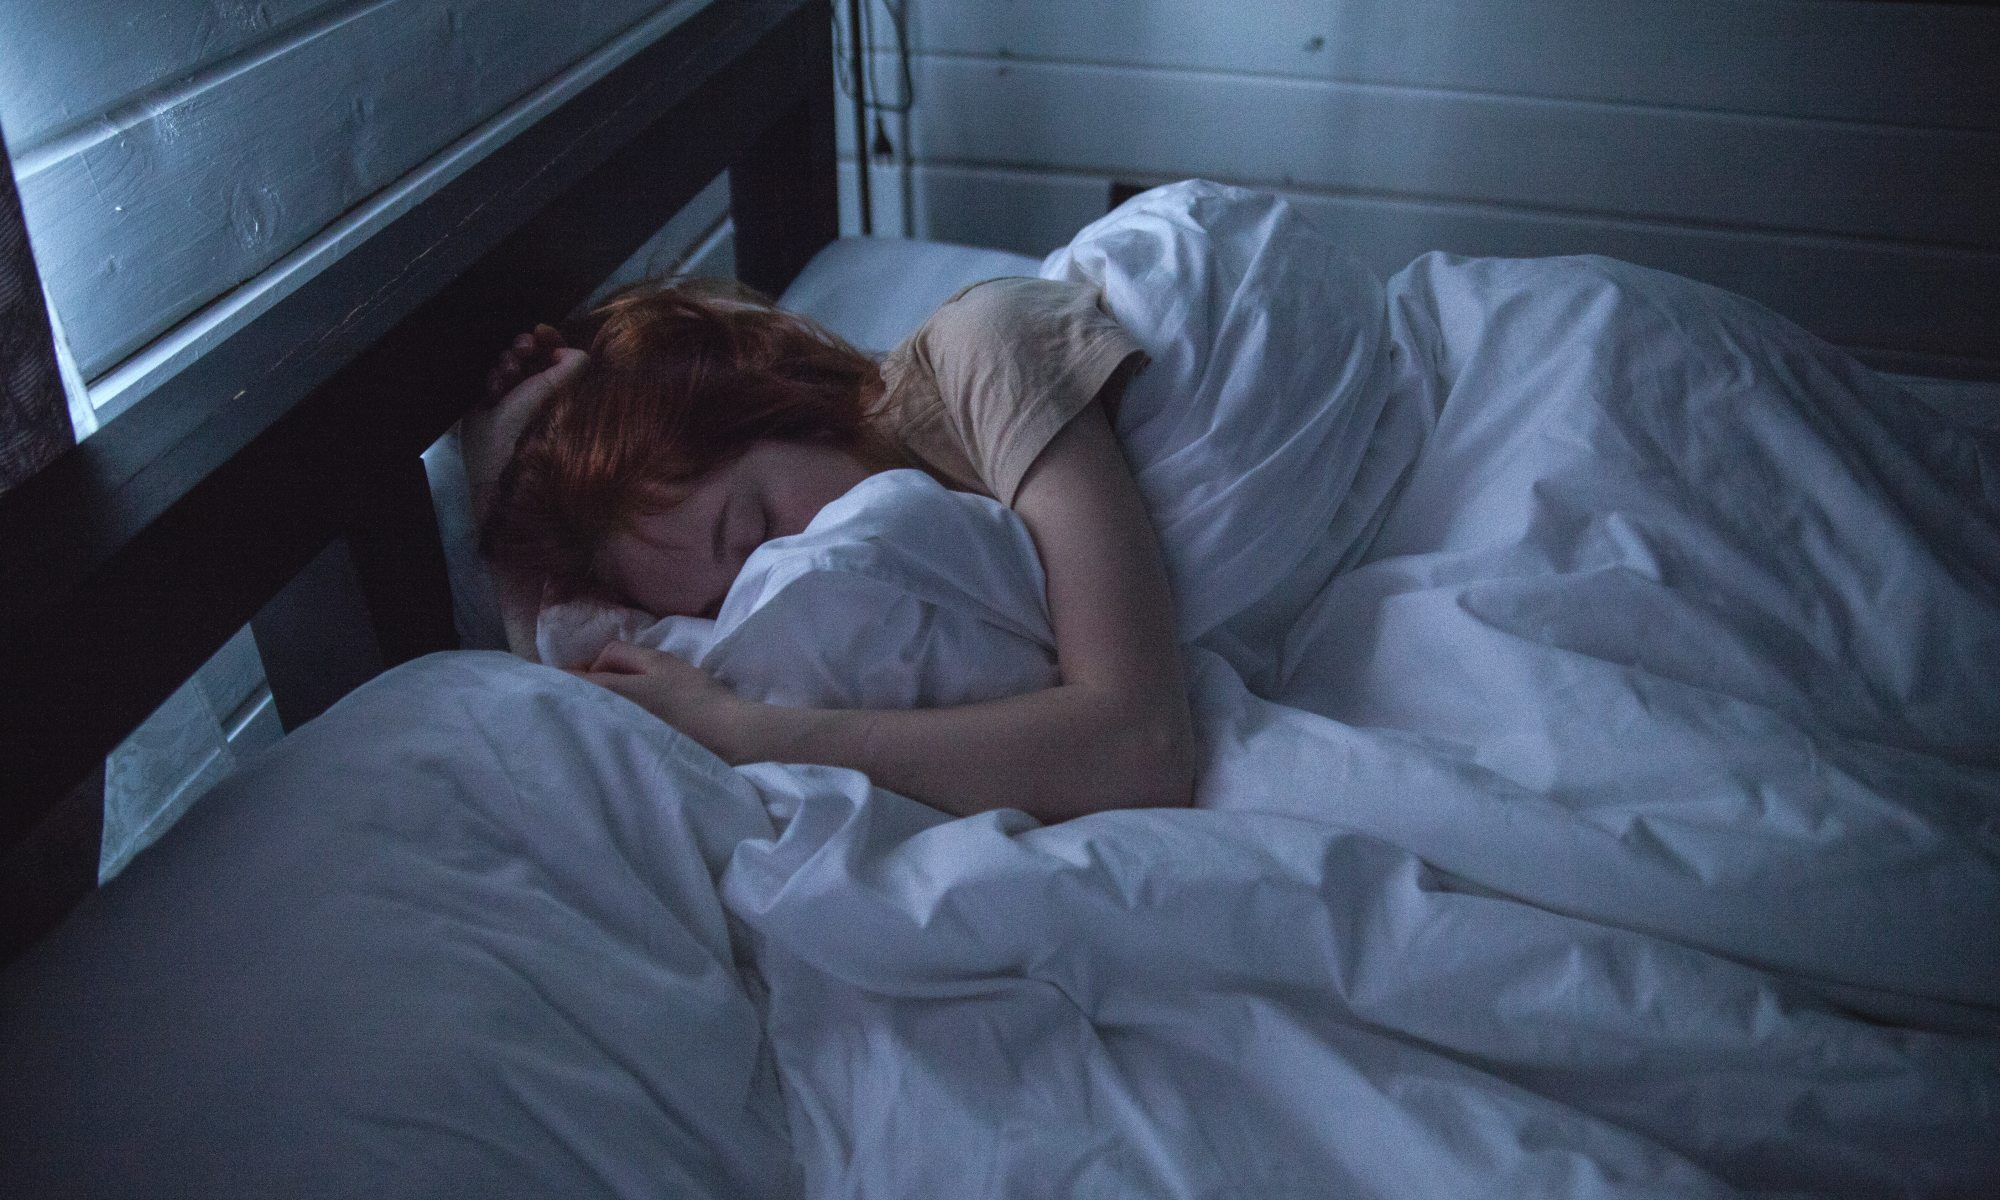 51ab8 adult asleep bed 935777